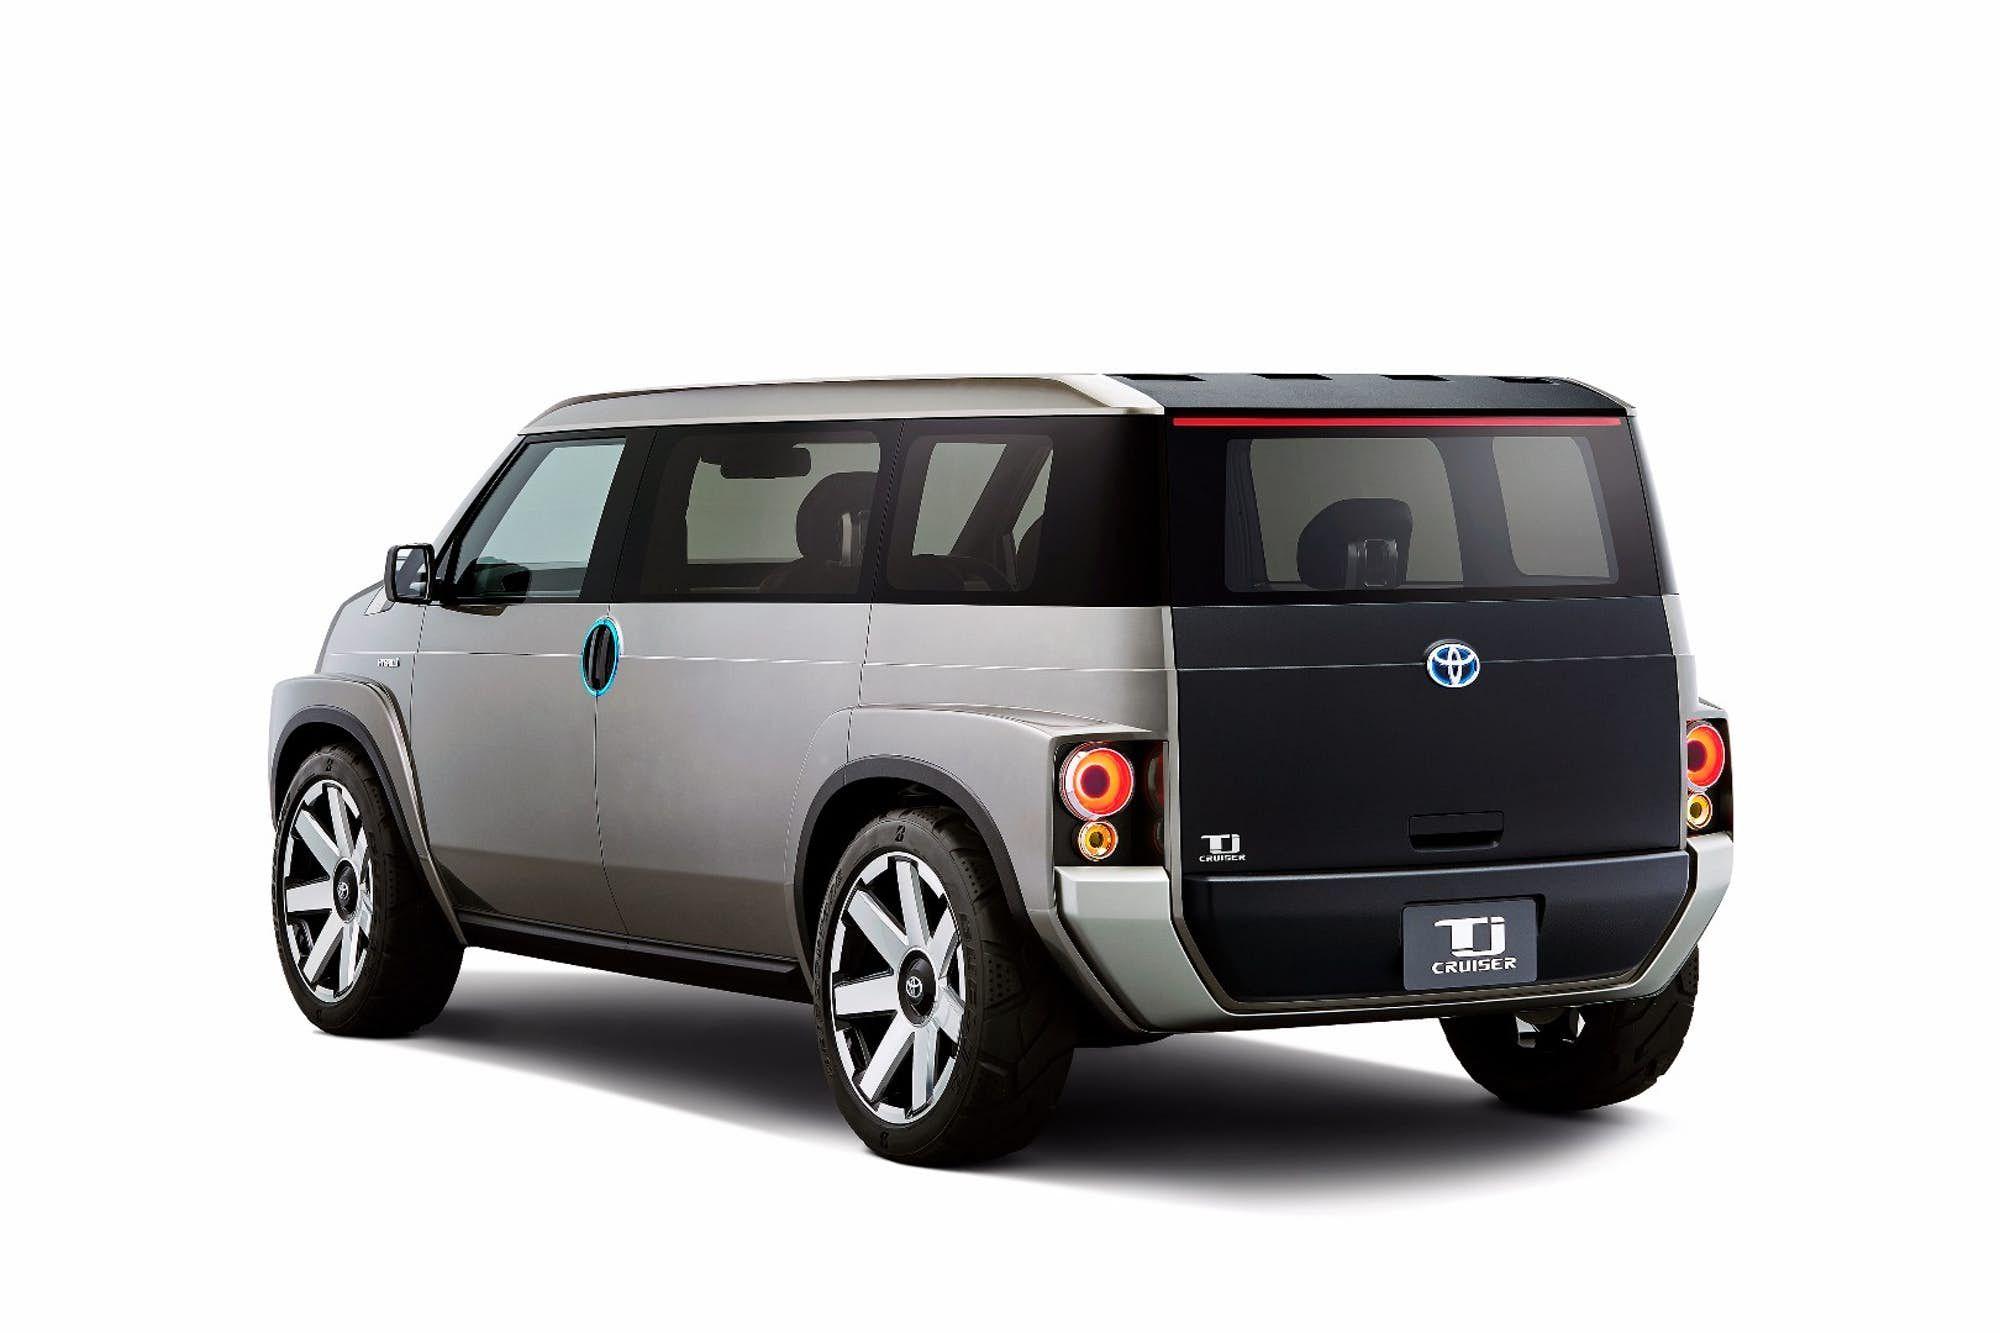 9757dc0eb5eaa6 Toyota Tj Cruiser concept – roomy SUV or tough van